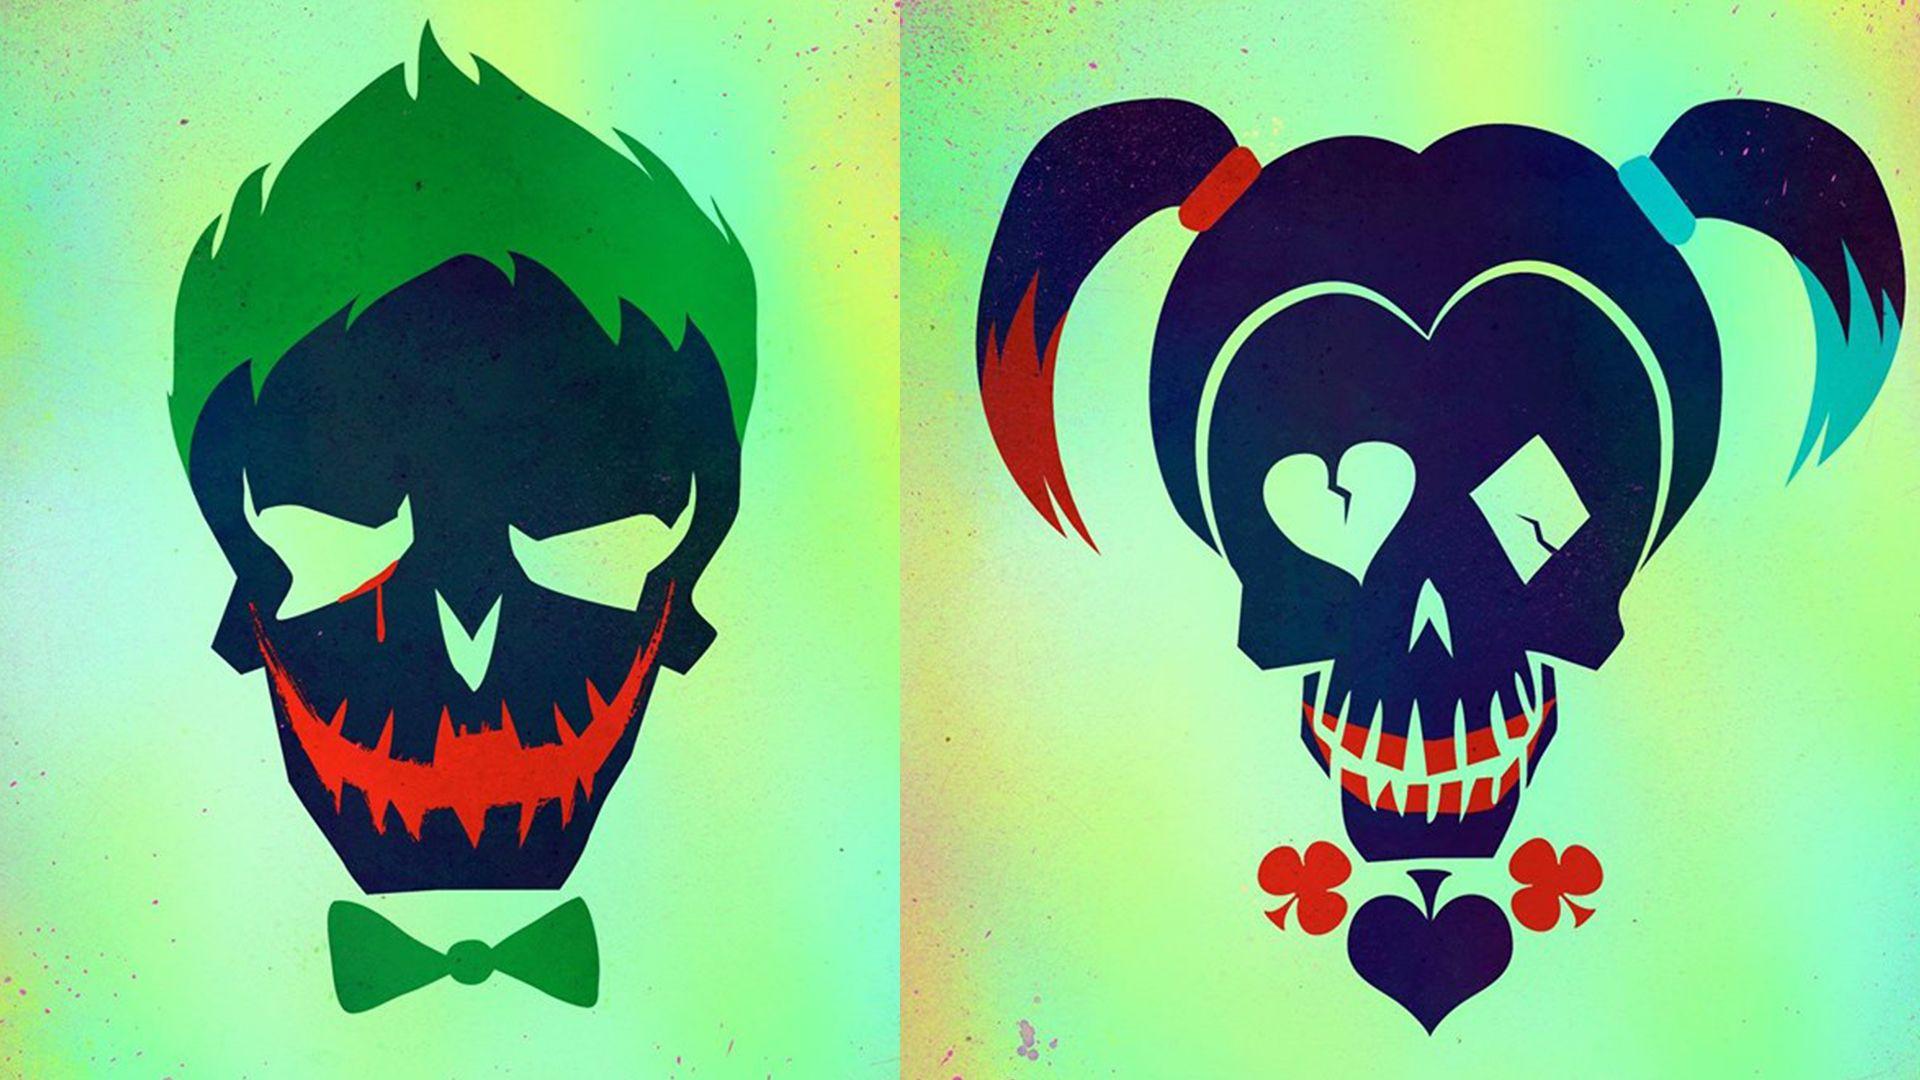 Fantastic Wallpaper Logo Harley Quinn - 931947f6f0843147223bdffce877c280  You Should Have_775551.jpg